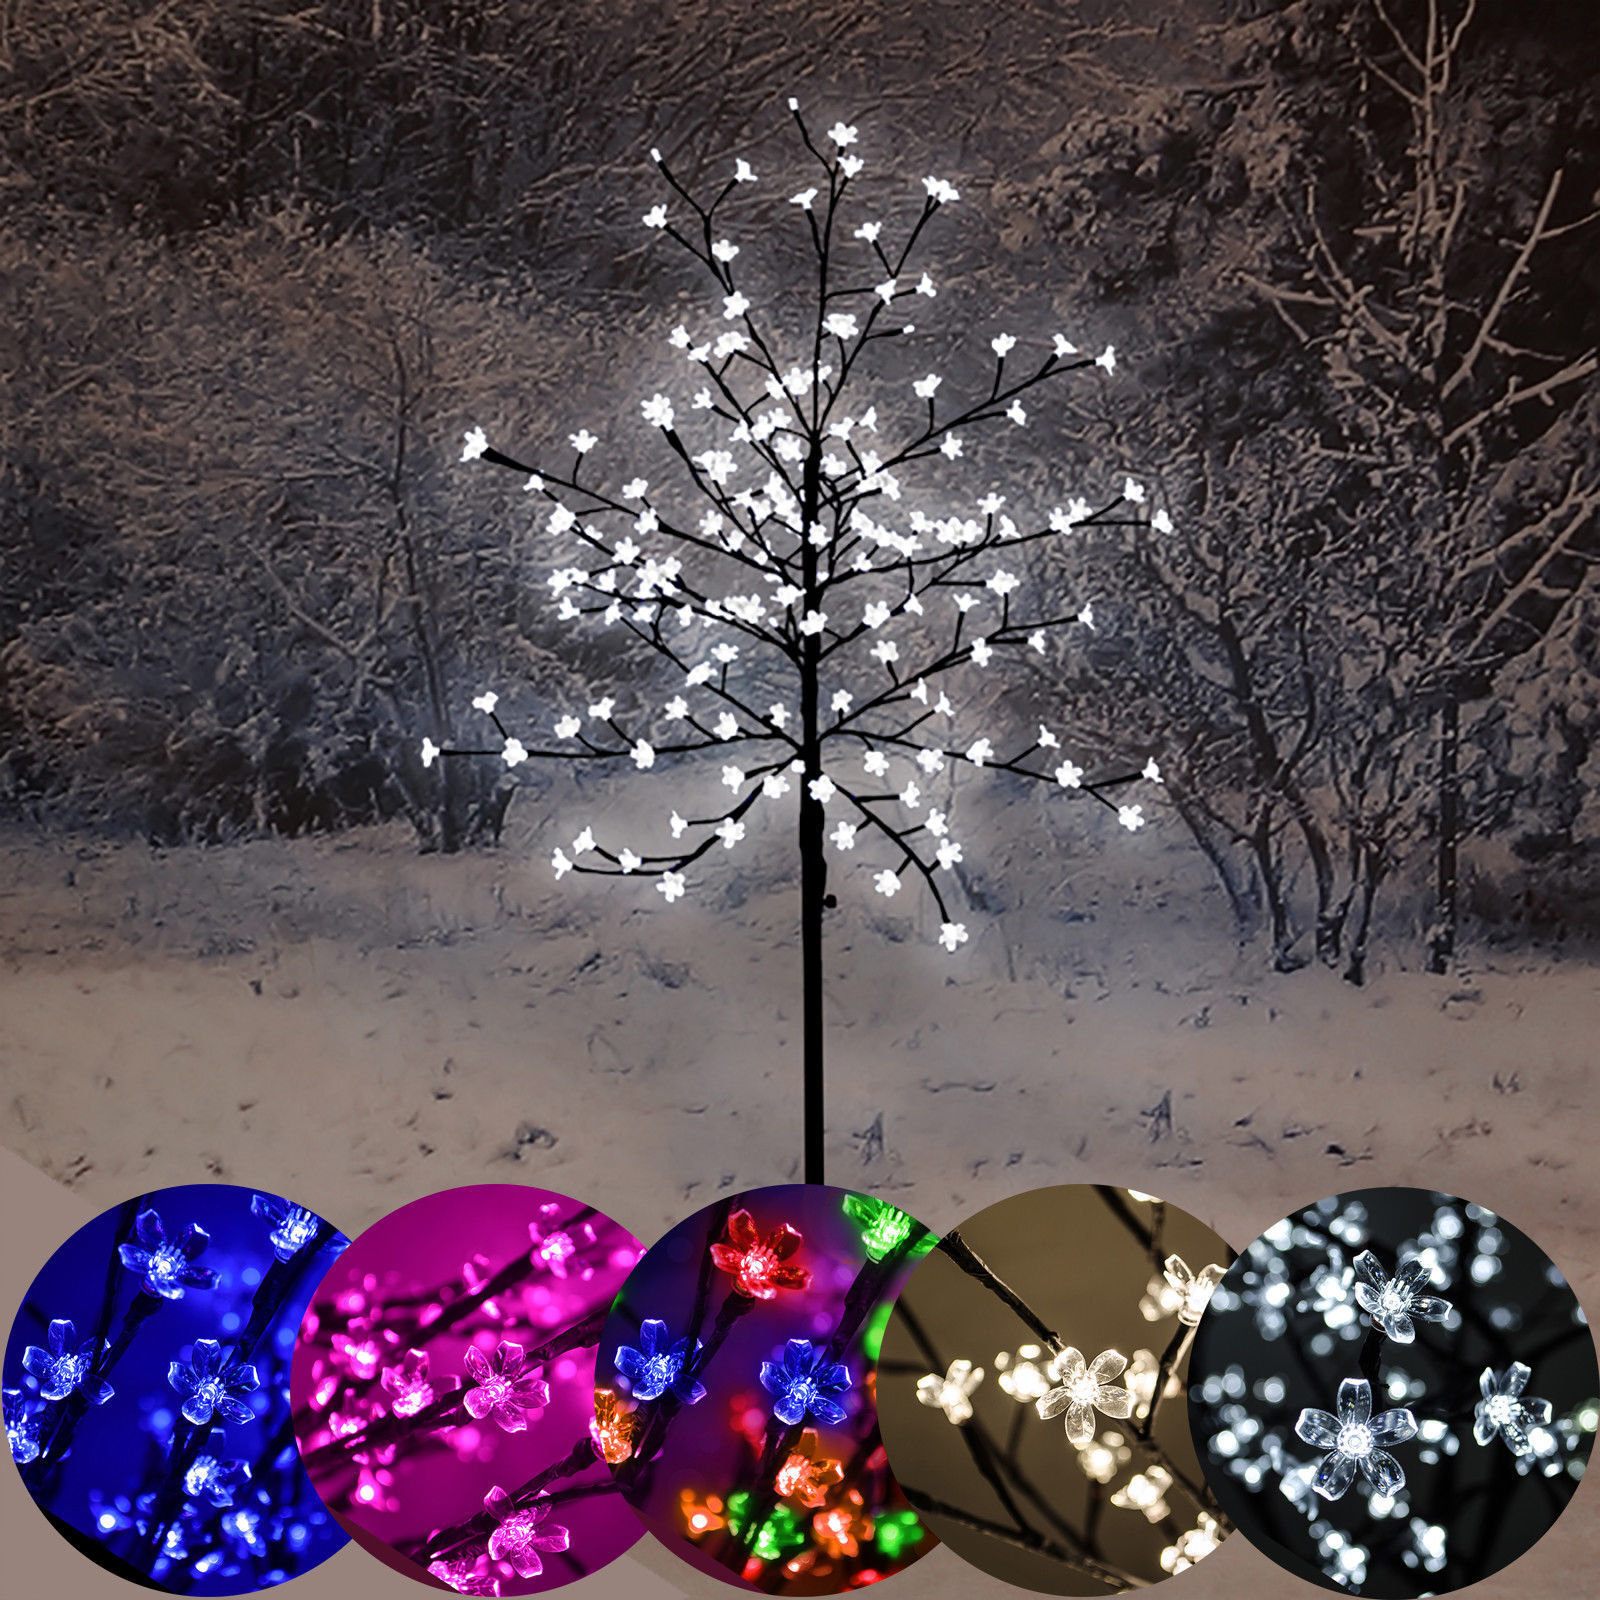 5 ft (approx. 1.52 m) 1.5 M LED Flor De Cerezo árbol Navidad 150 Luces al aire libre Interior